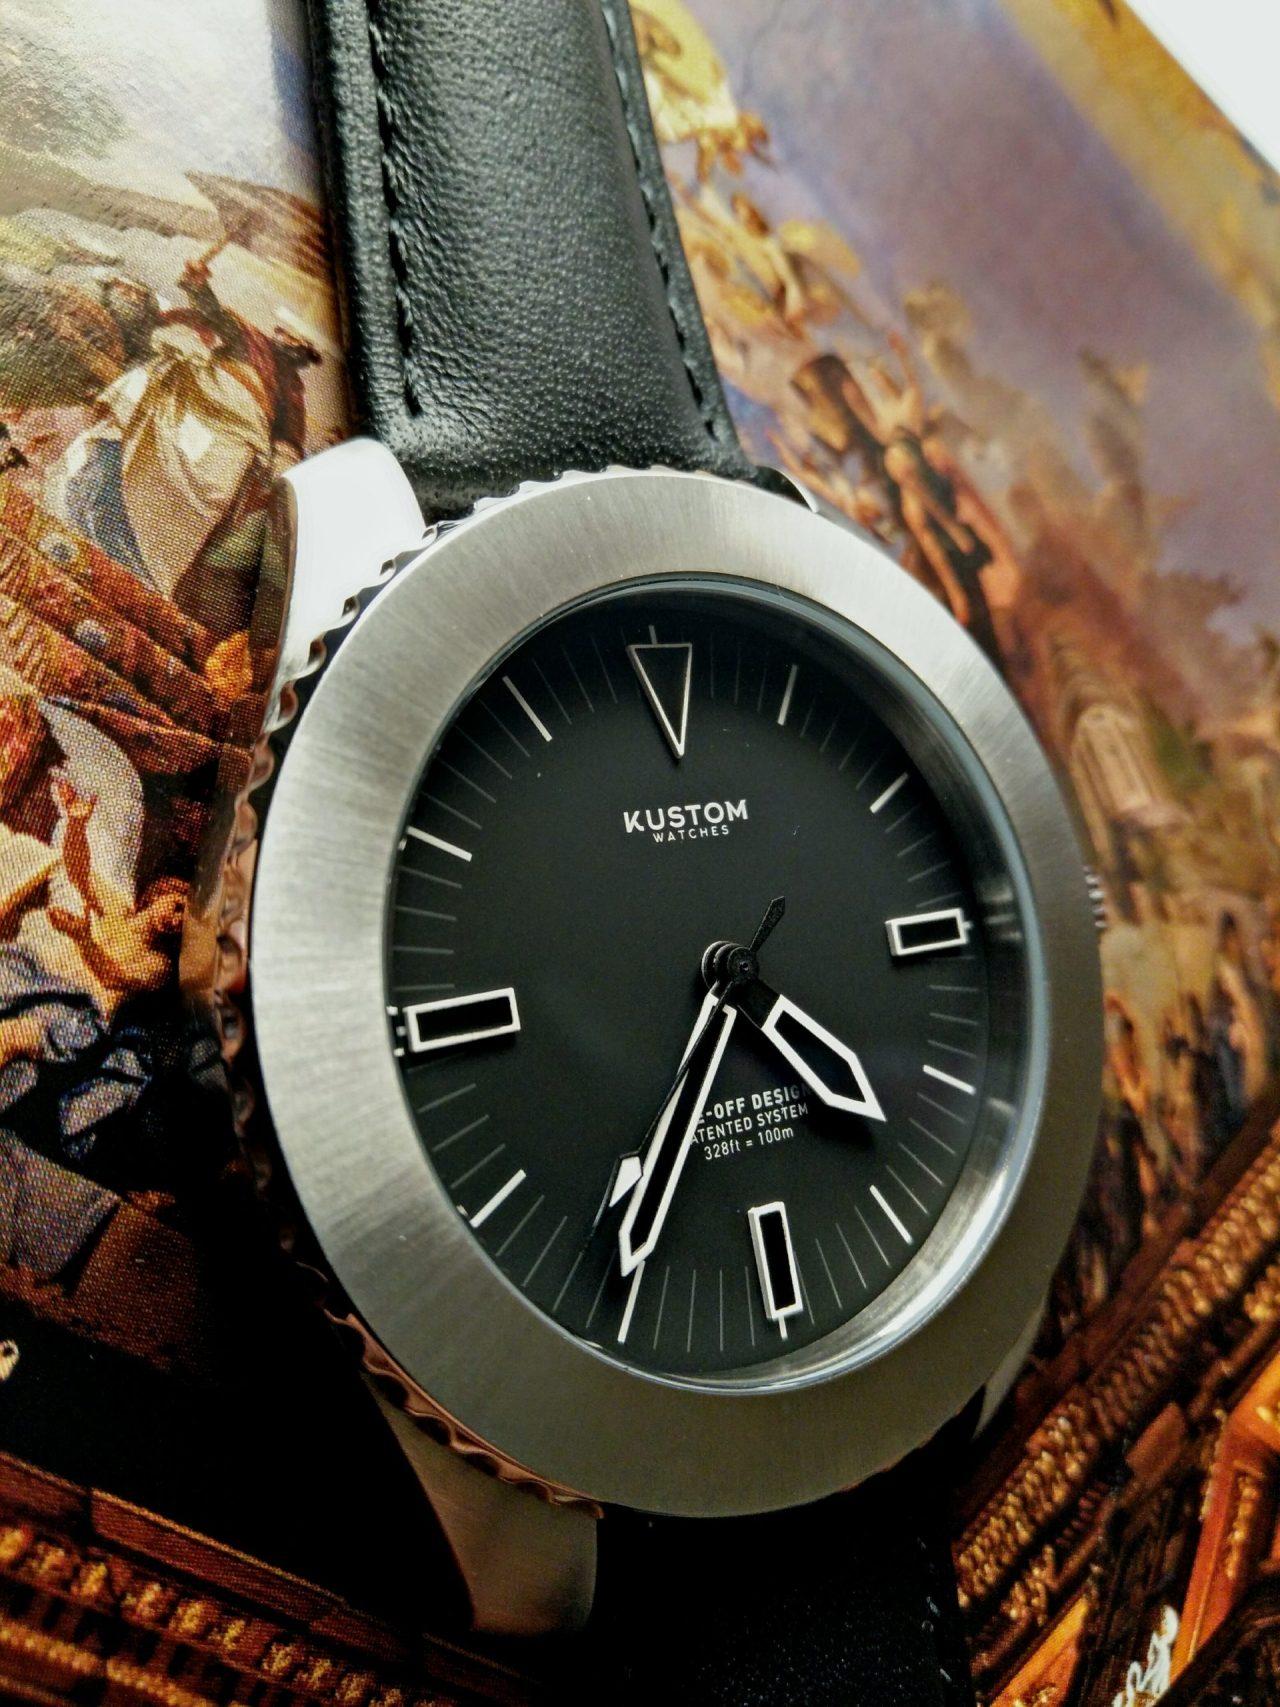 Kustom watches side